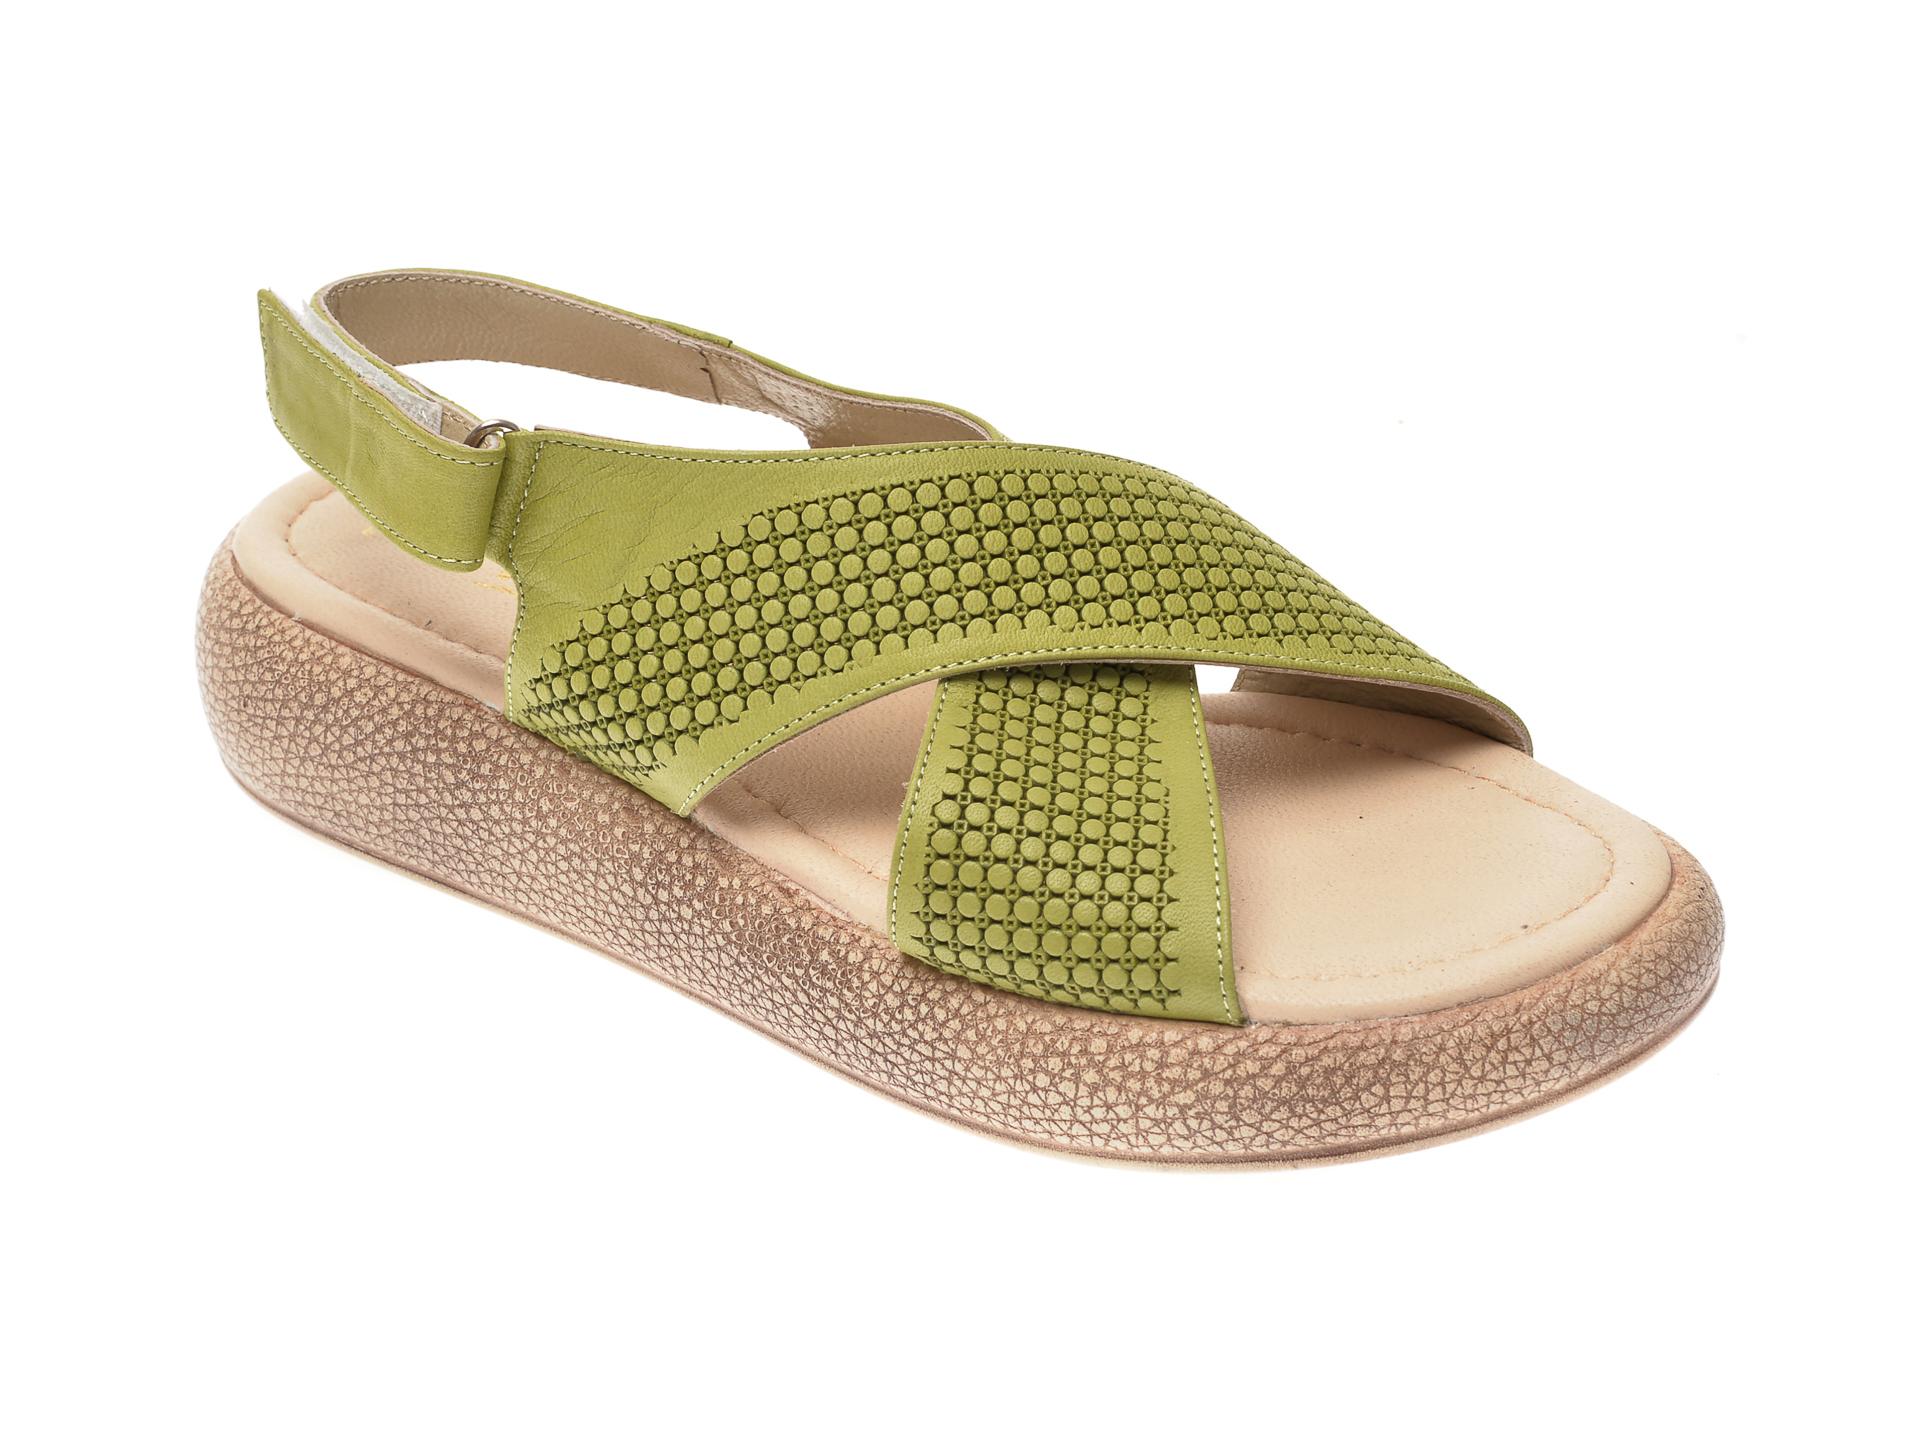 Sandale IMAGE verzi, 6025, din piele naturala imagine